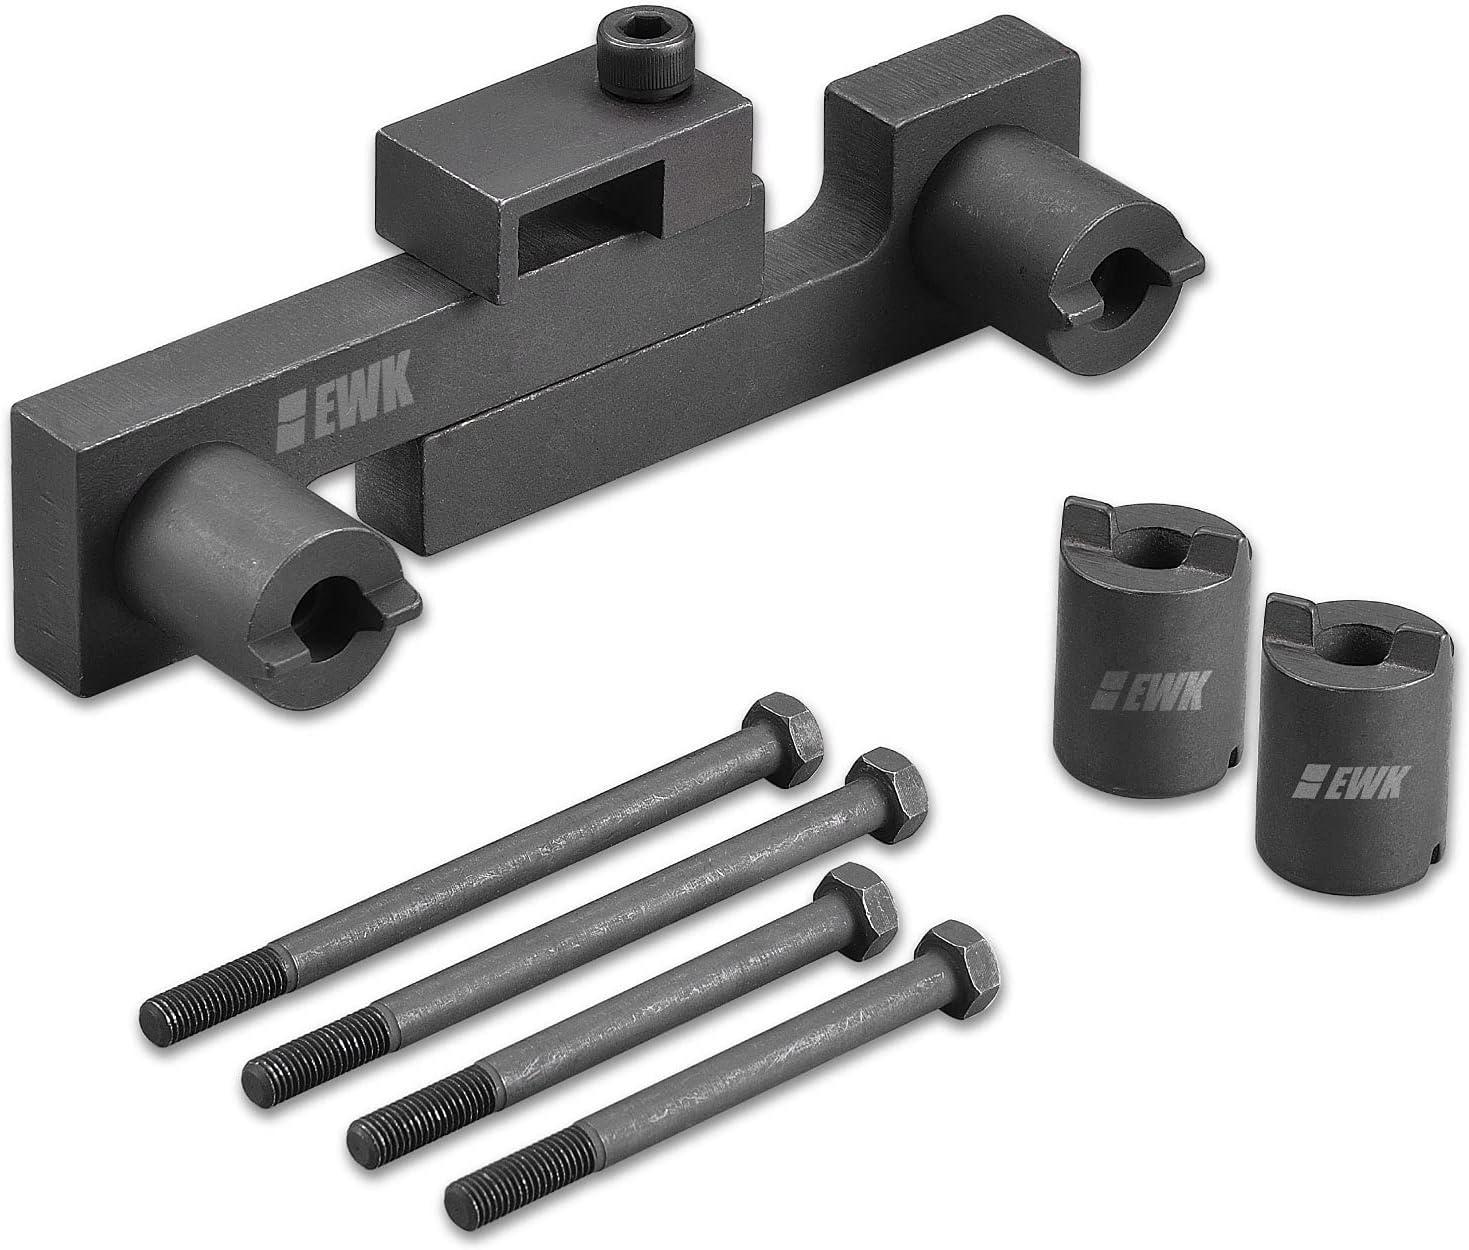 EWK Volvo S40 S60 XC90 Tool Very popular Product Camshaft Timing Locking K